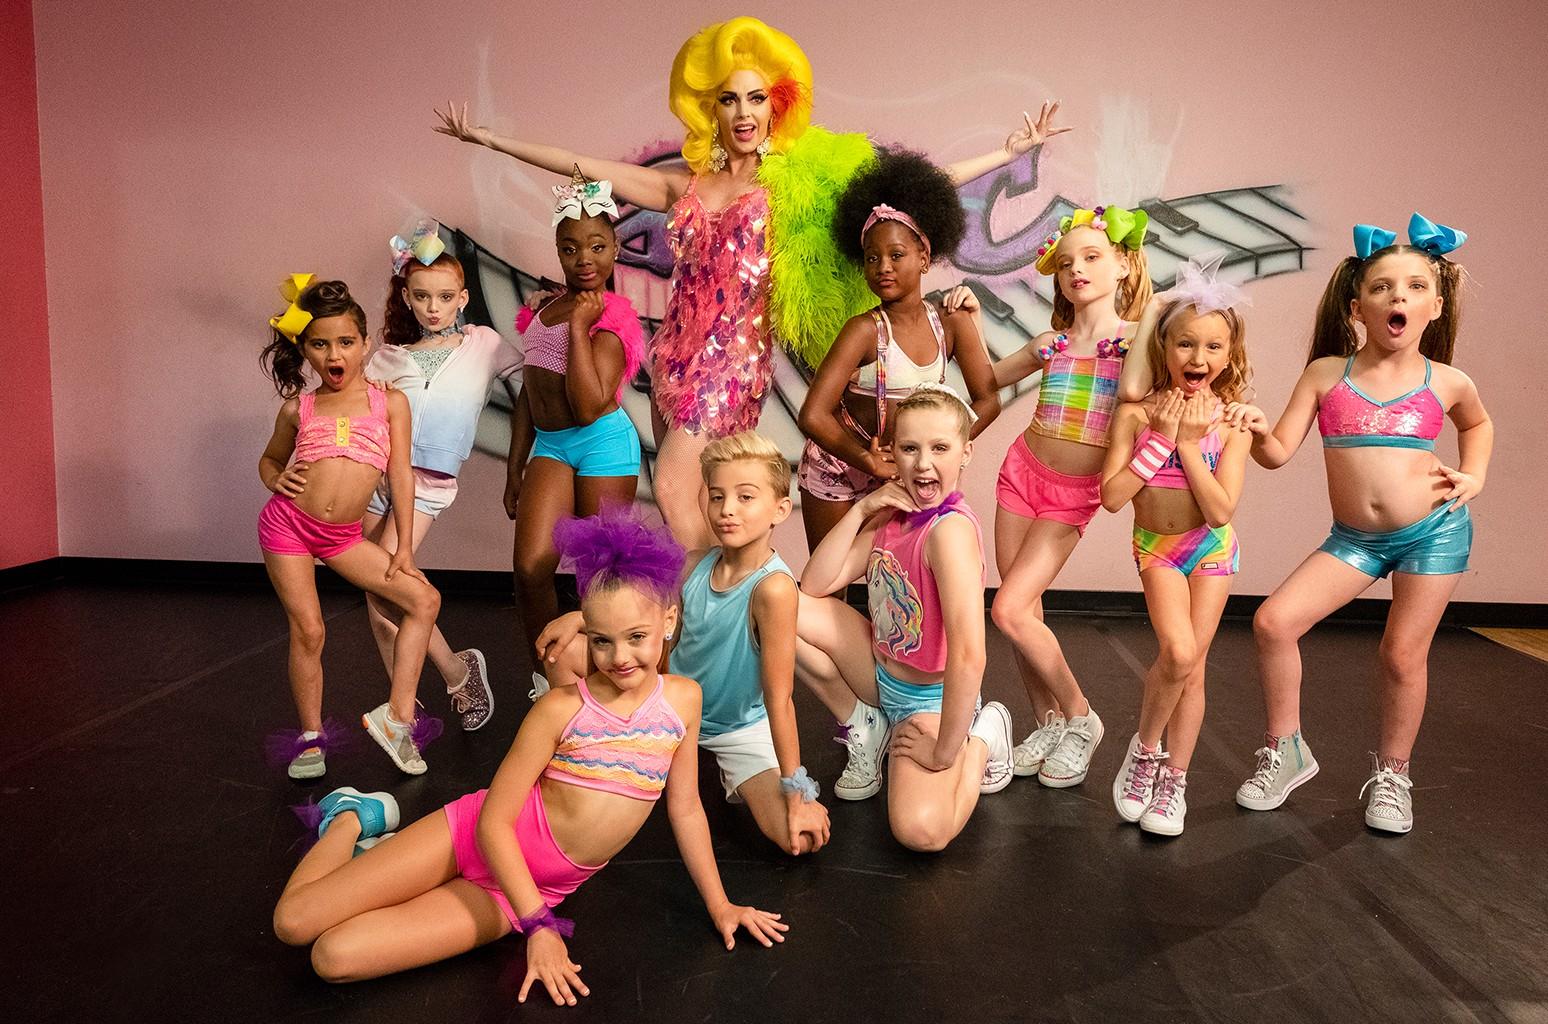 Alyssa Edwards Dancing Queens